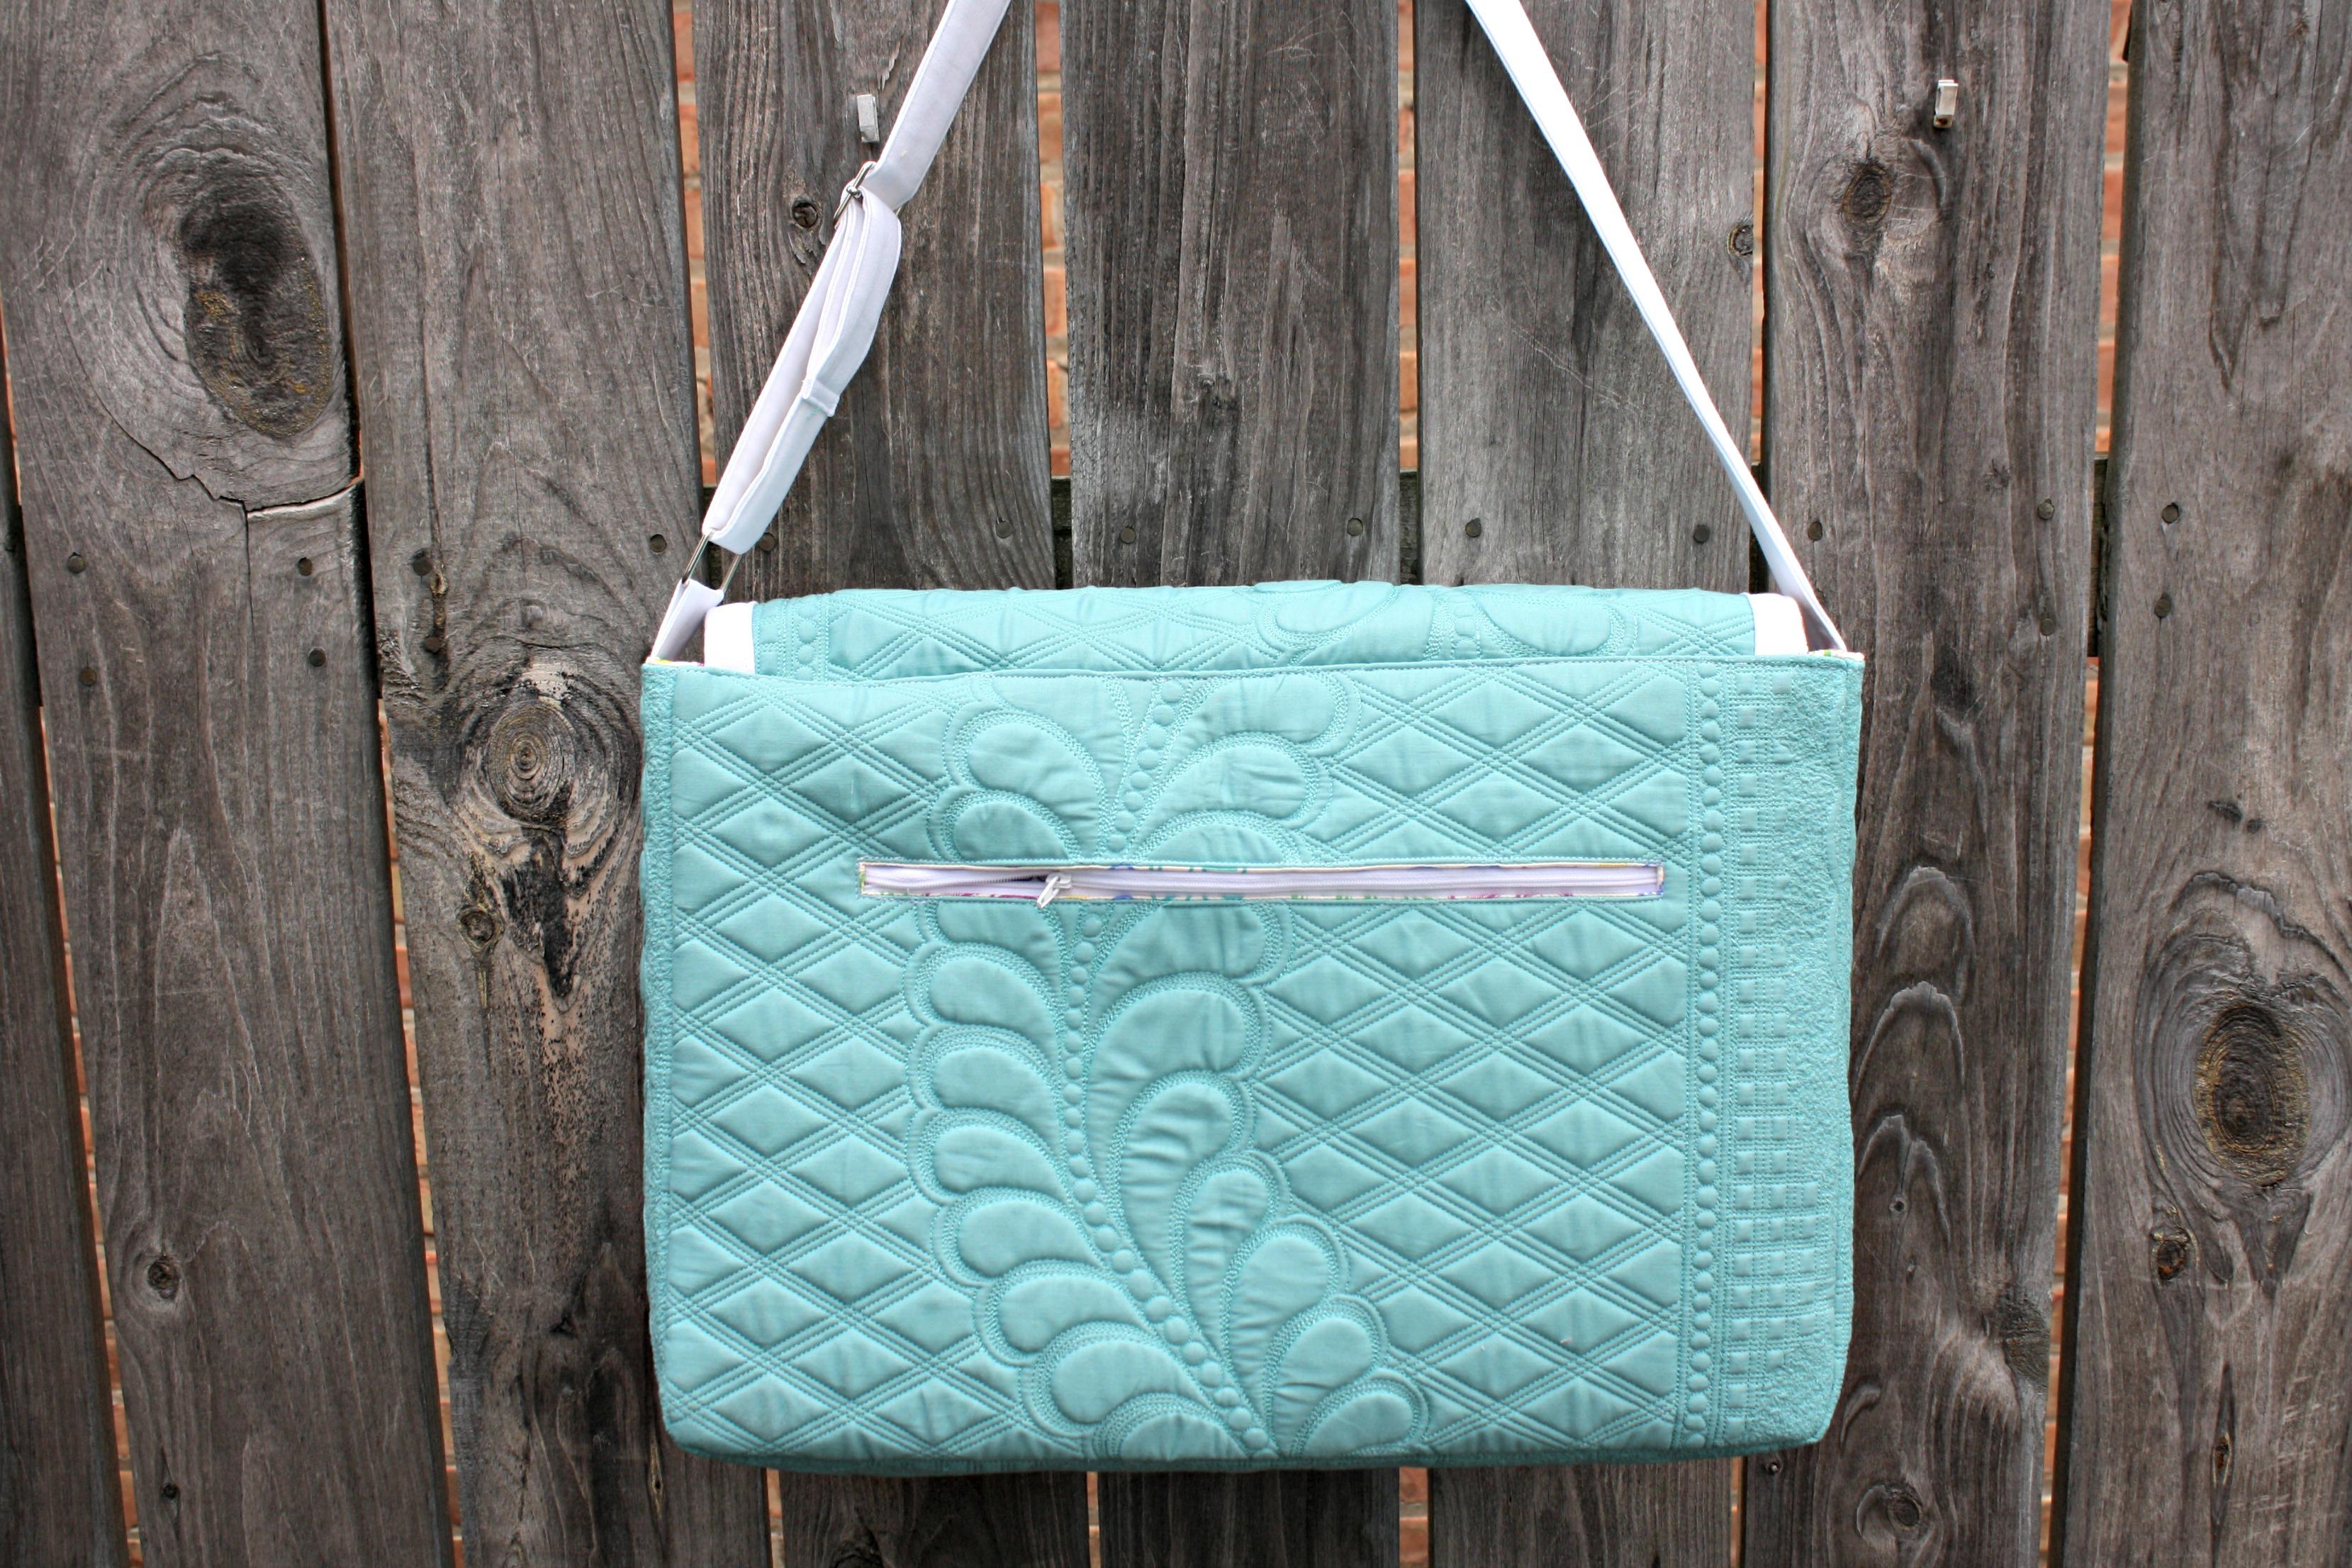 Zippered pocket on the back of a bag (Lilium Laptop Bag).